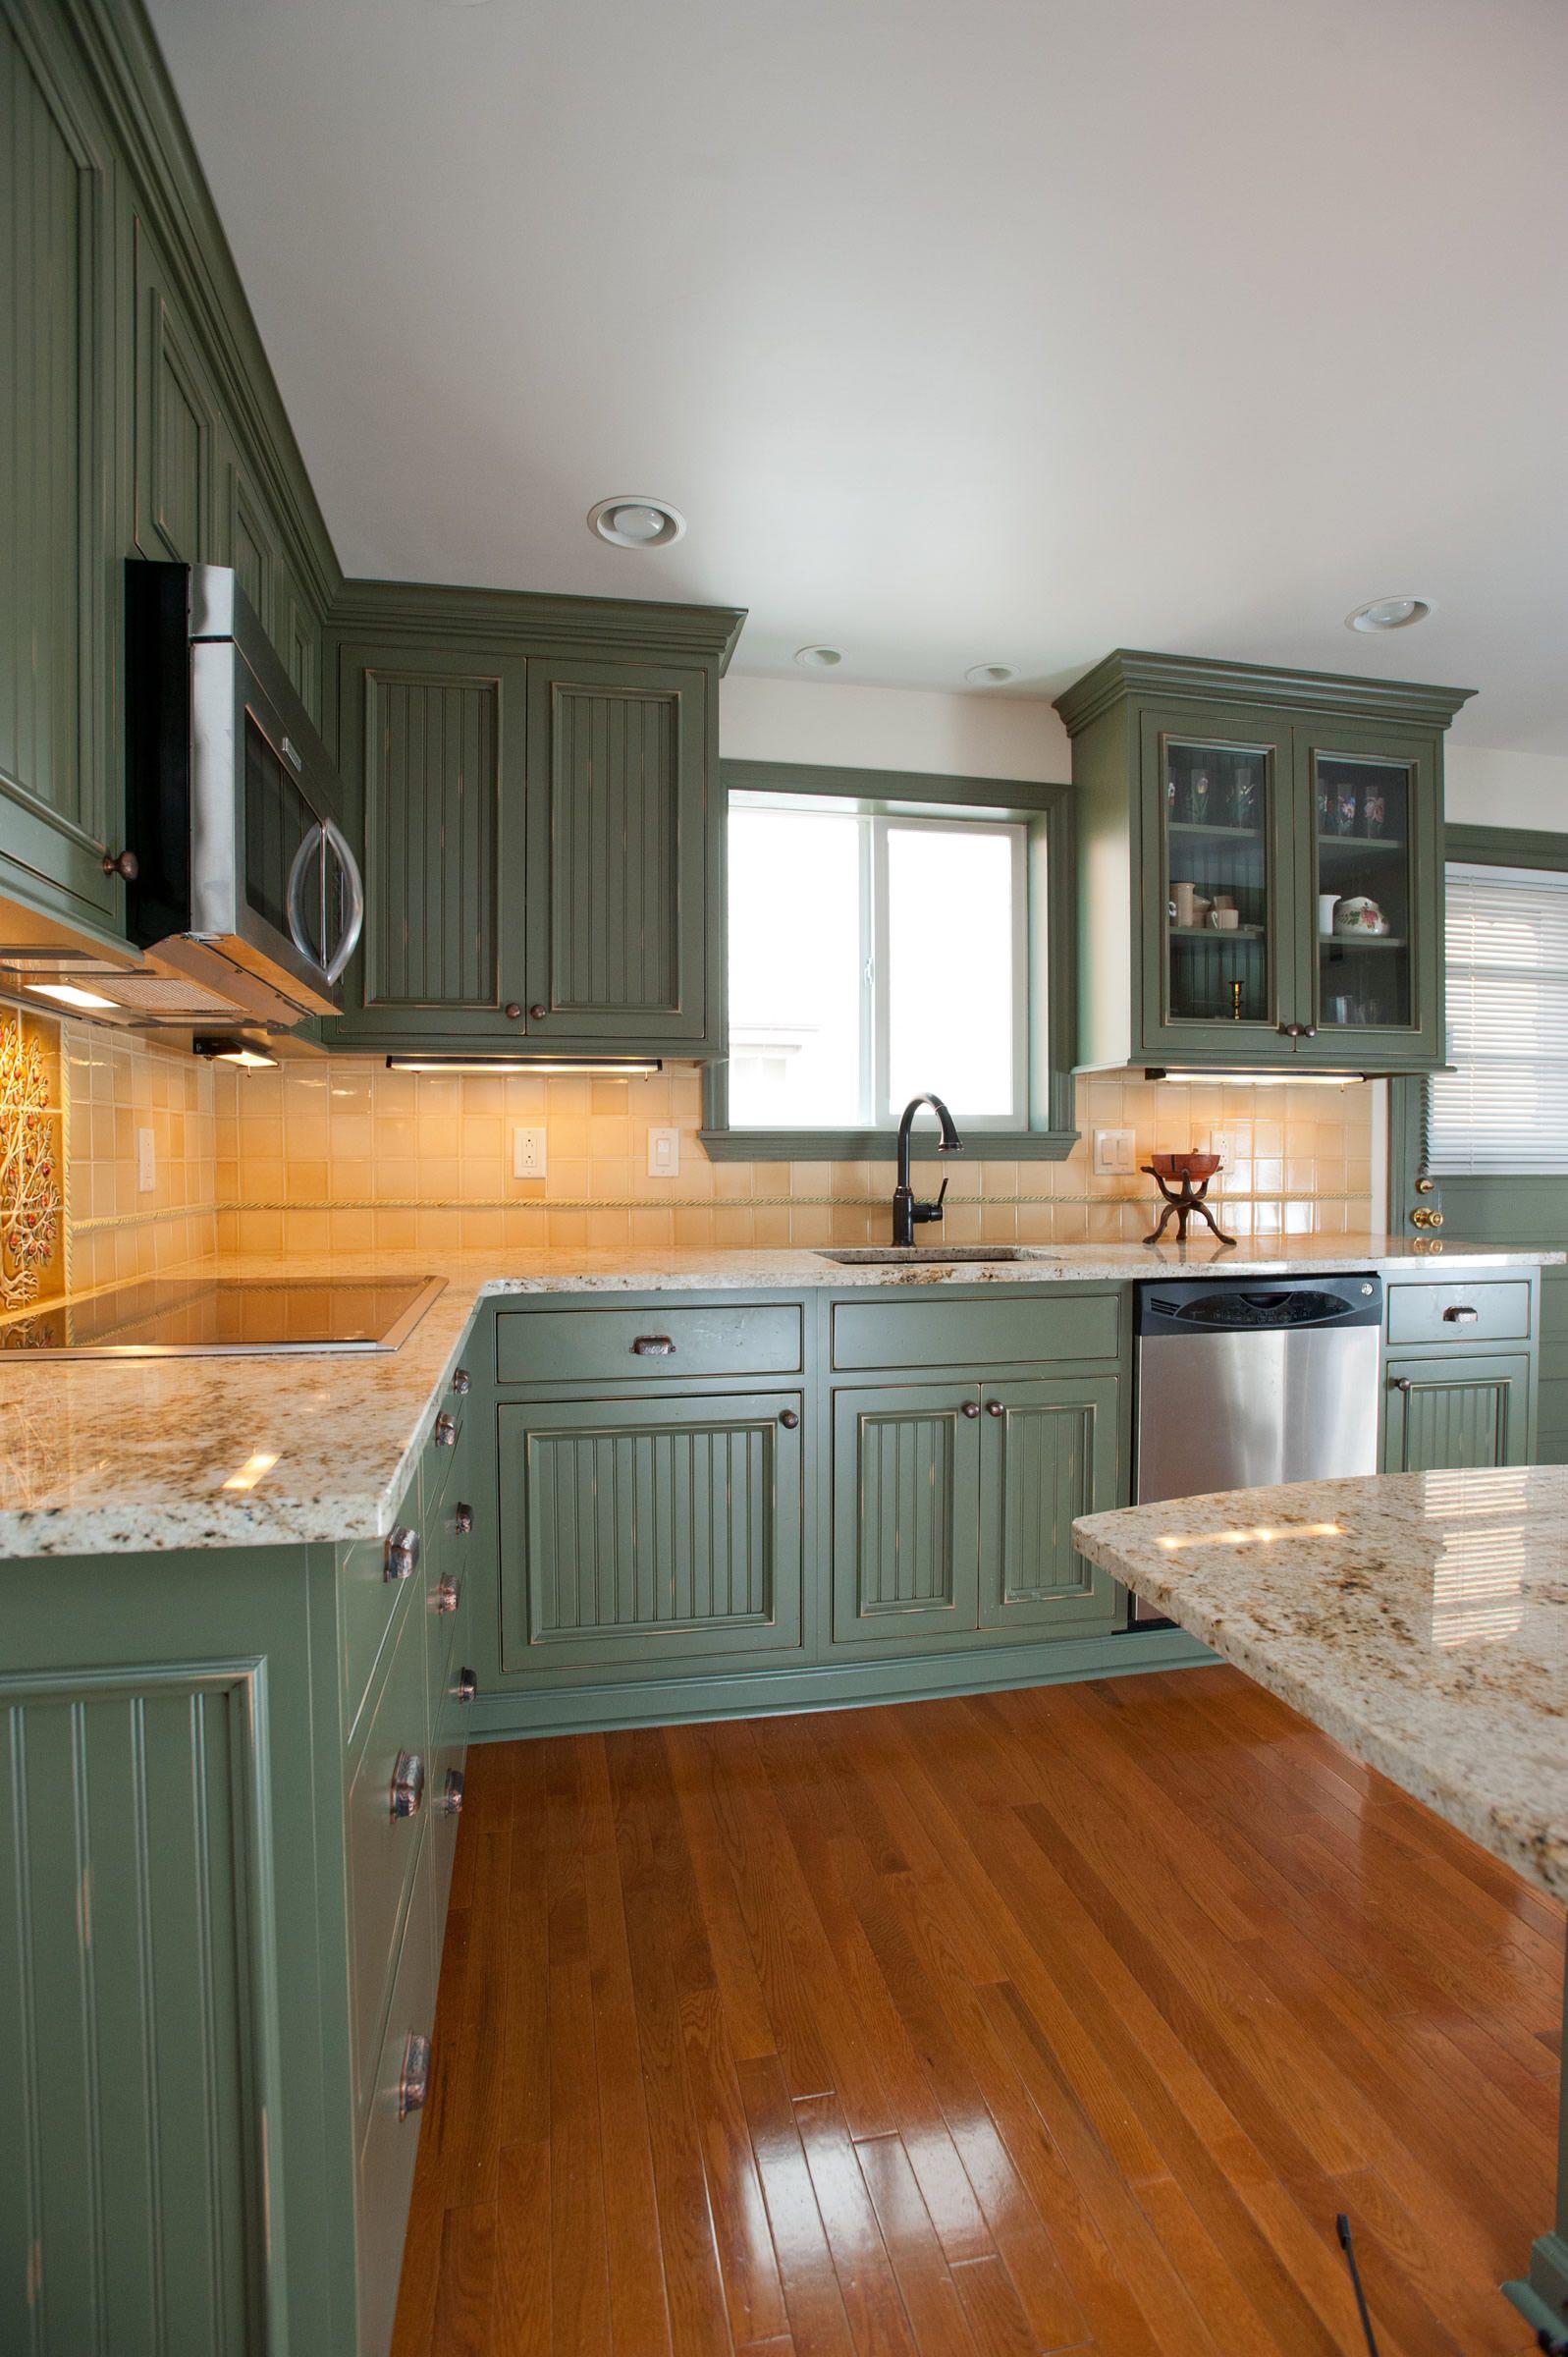 Kitchen Planning, Design, Installation, Remodeling